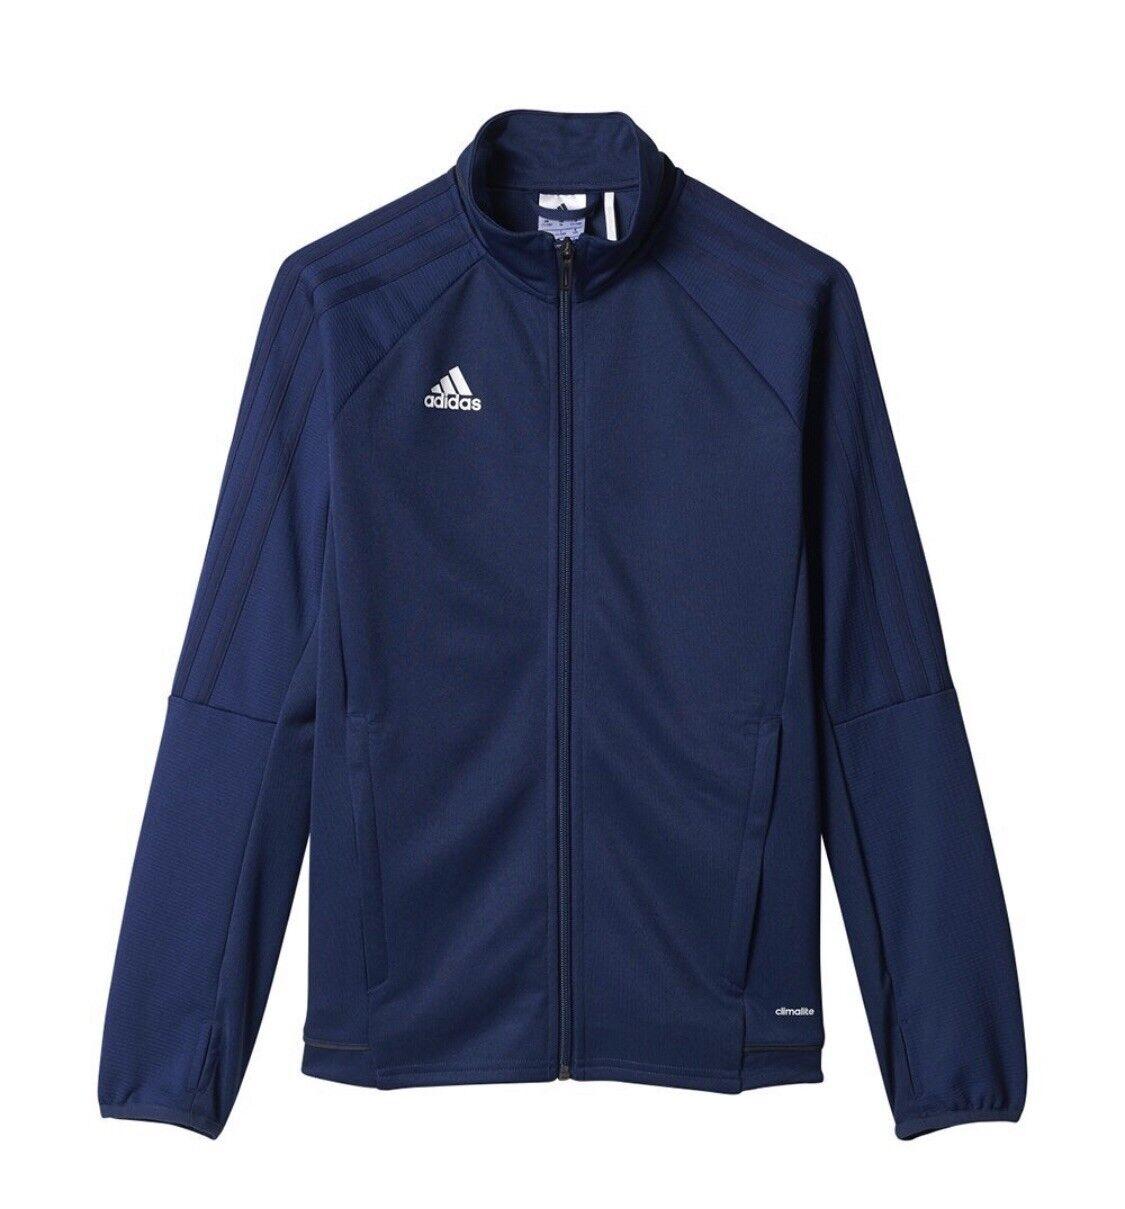 e21af41692f0 adidas Youth Tiro 17 Training Jacket Bold Blue black white Br2701 L ...